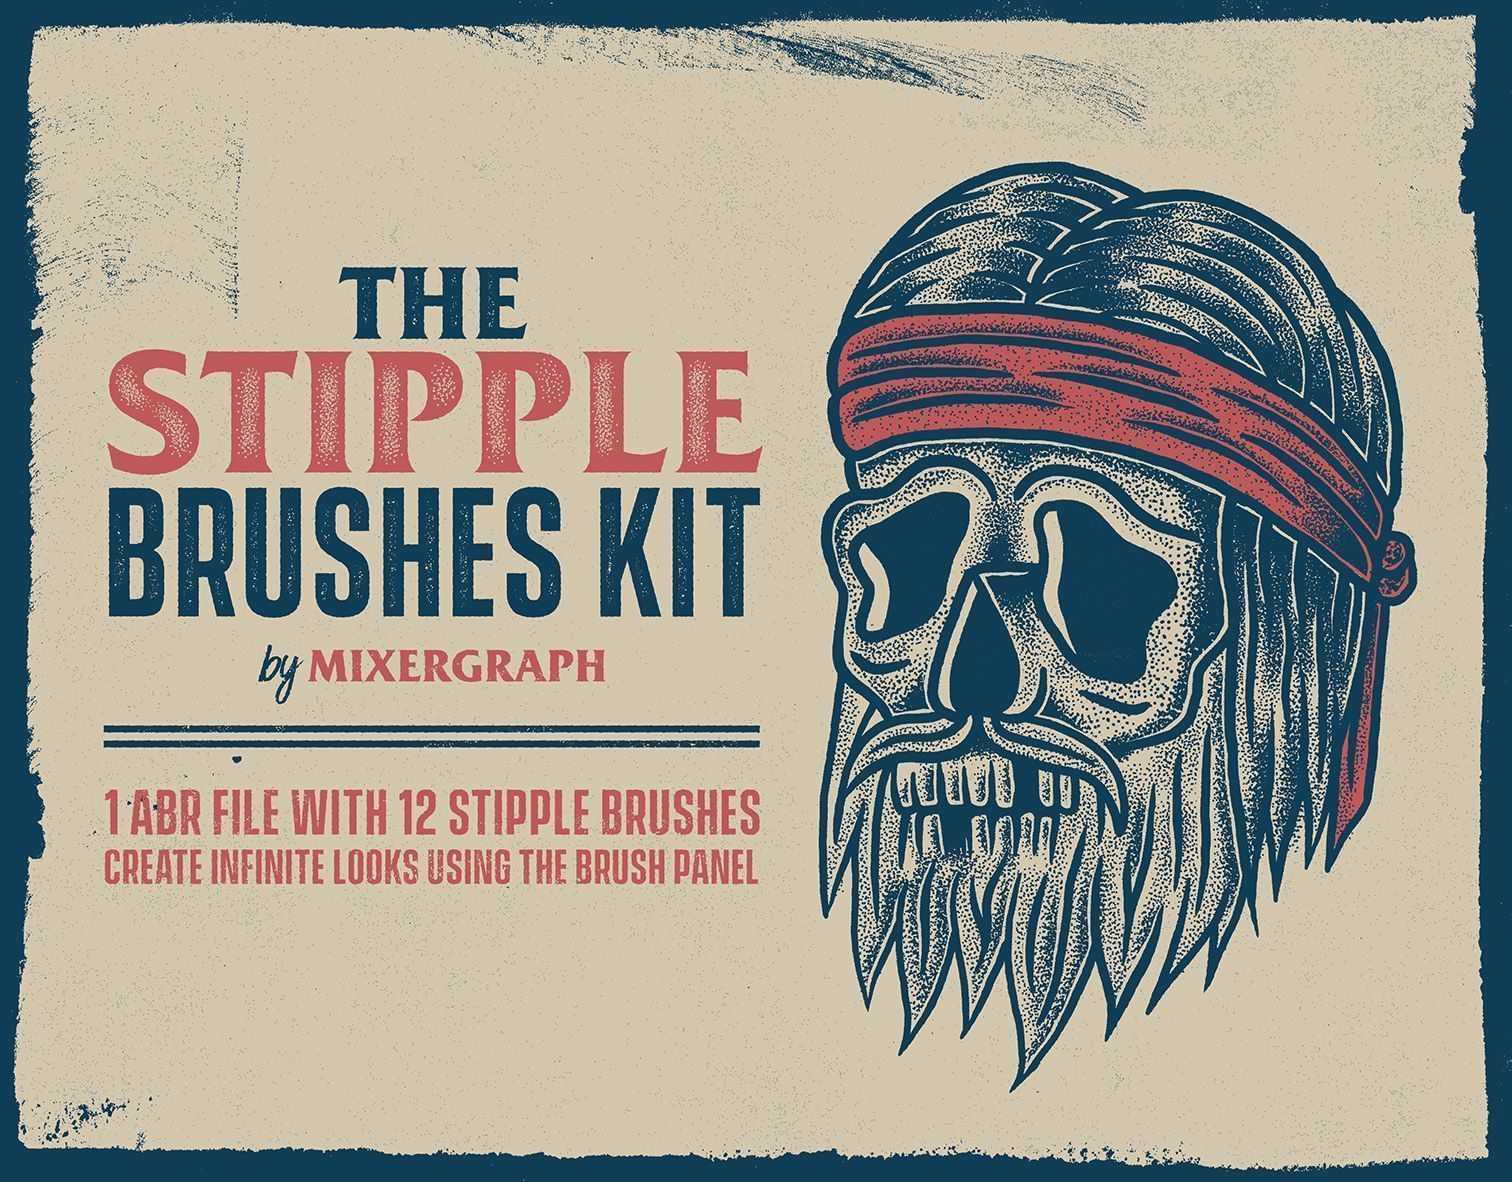 Mixergraph The Stipple Brushes kit